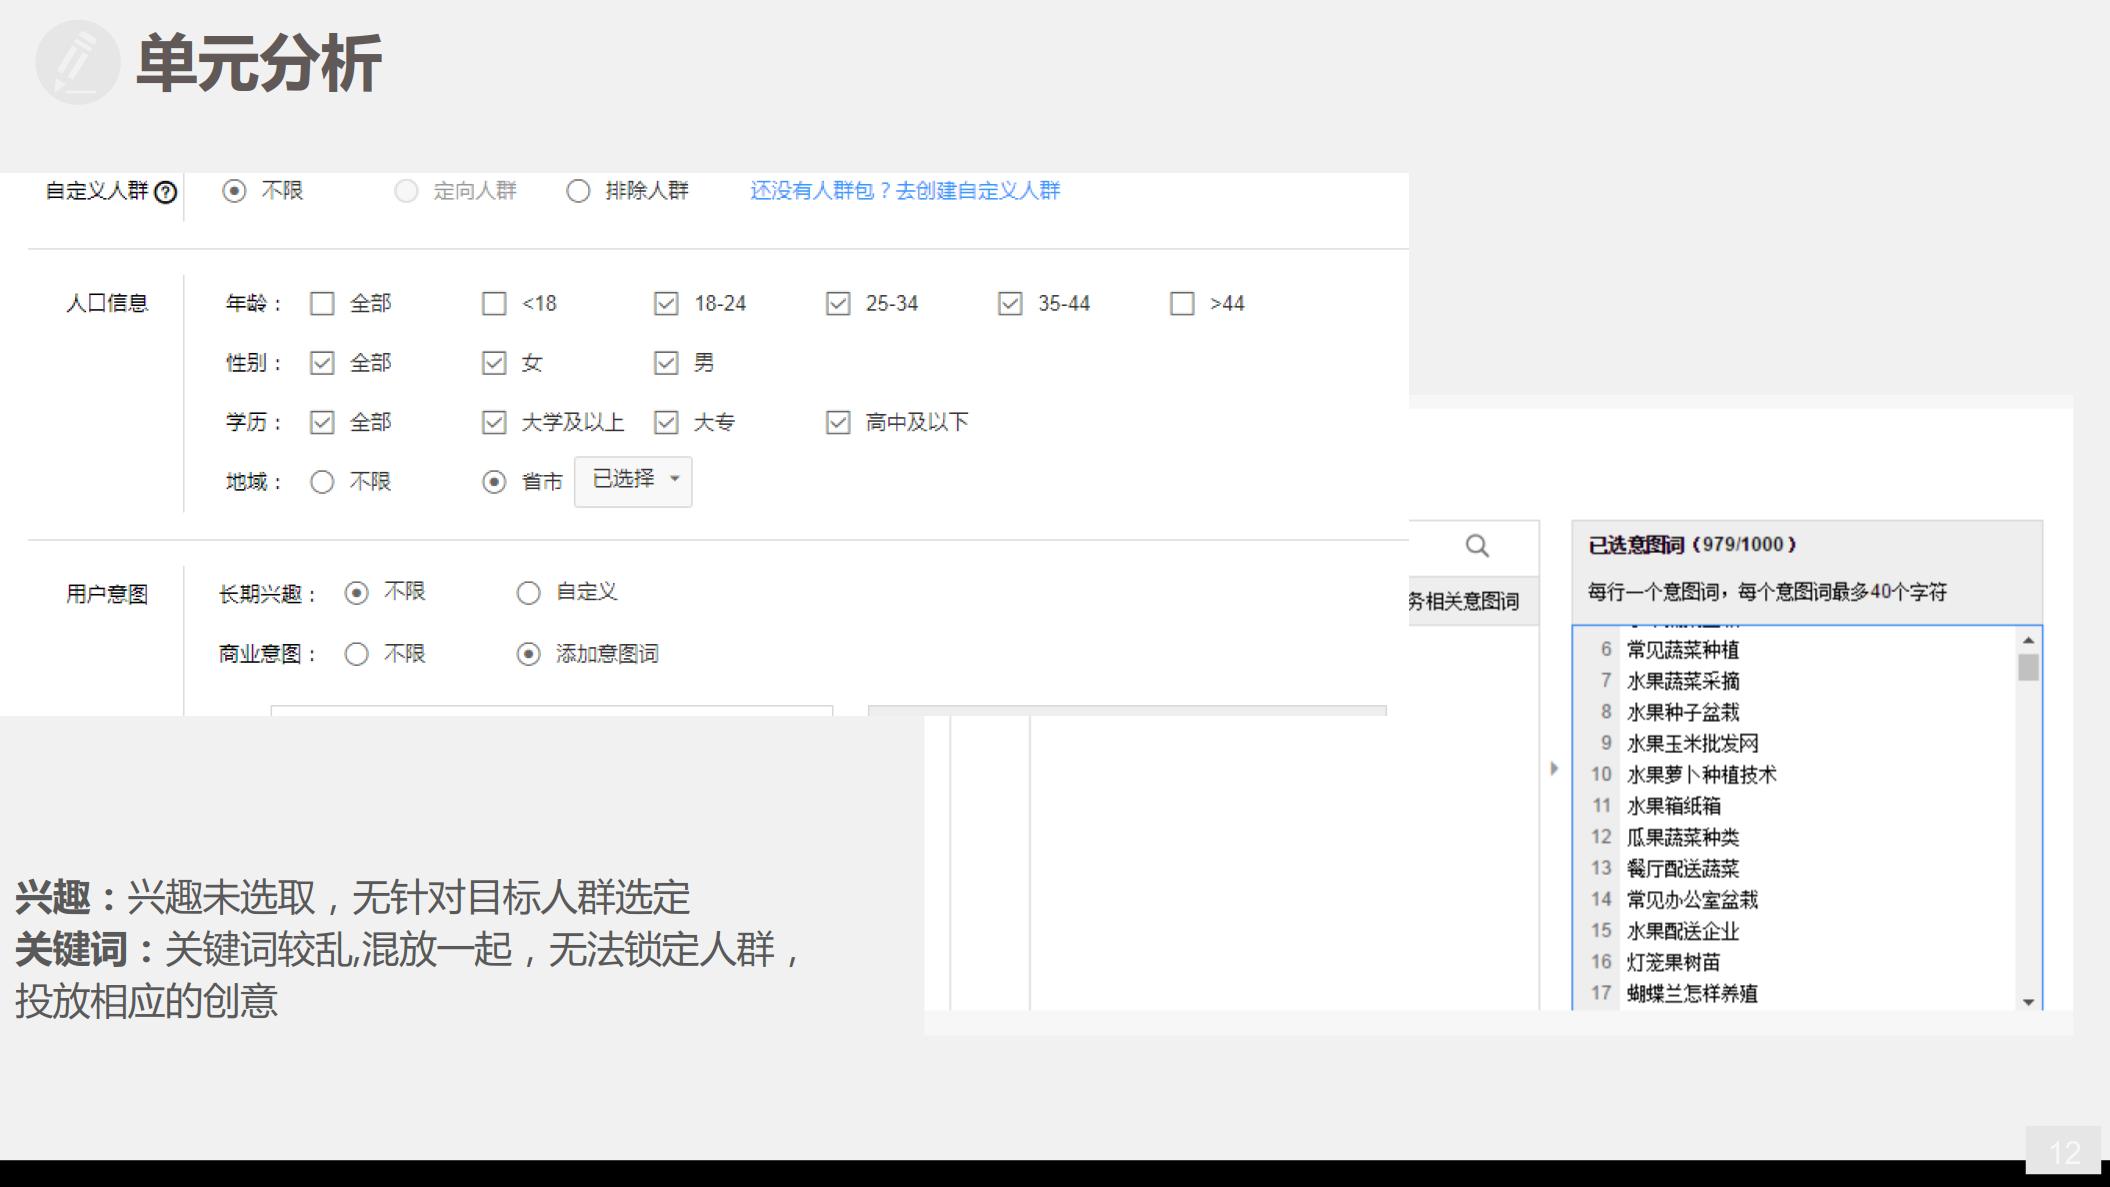 F1+vbj村小爱+软件游戏+张洁0608_12.png